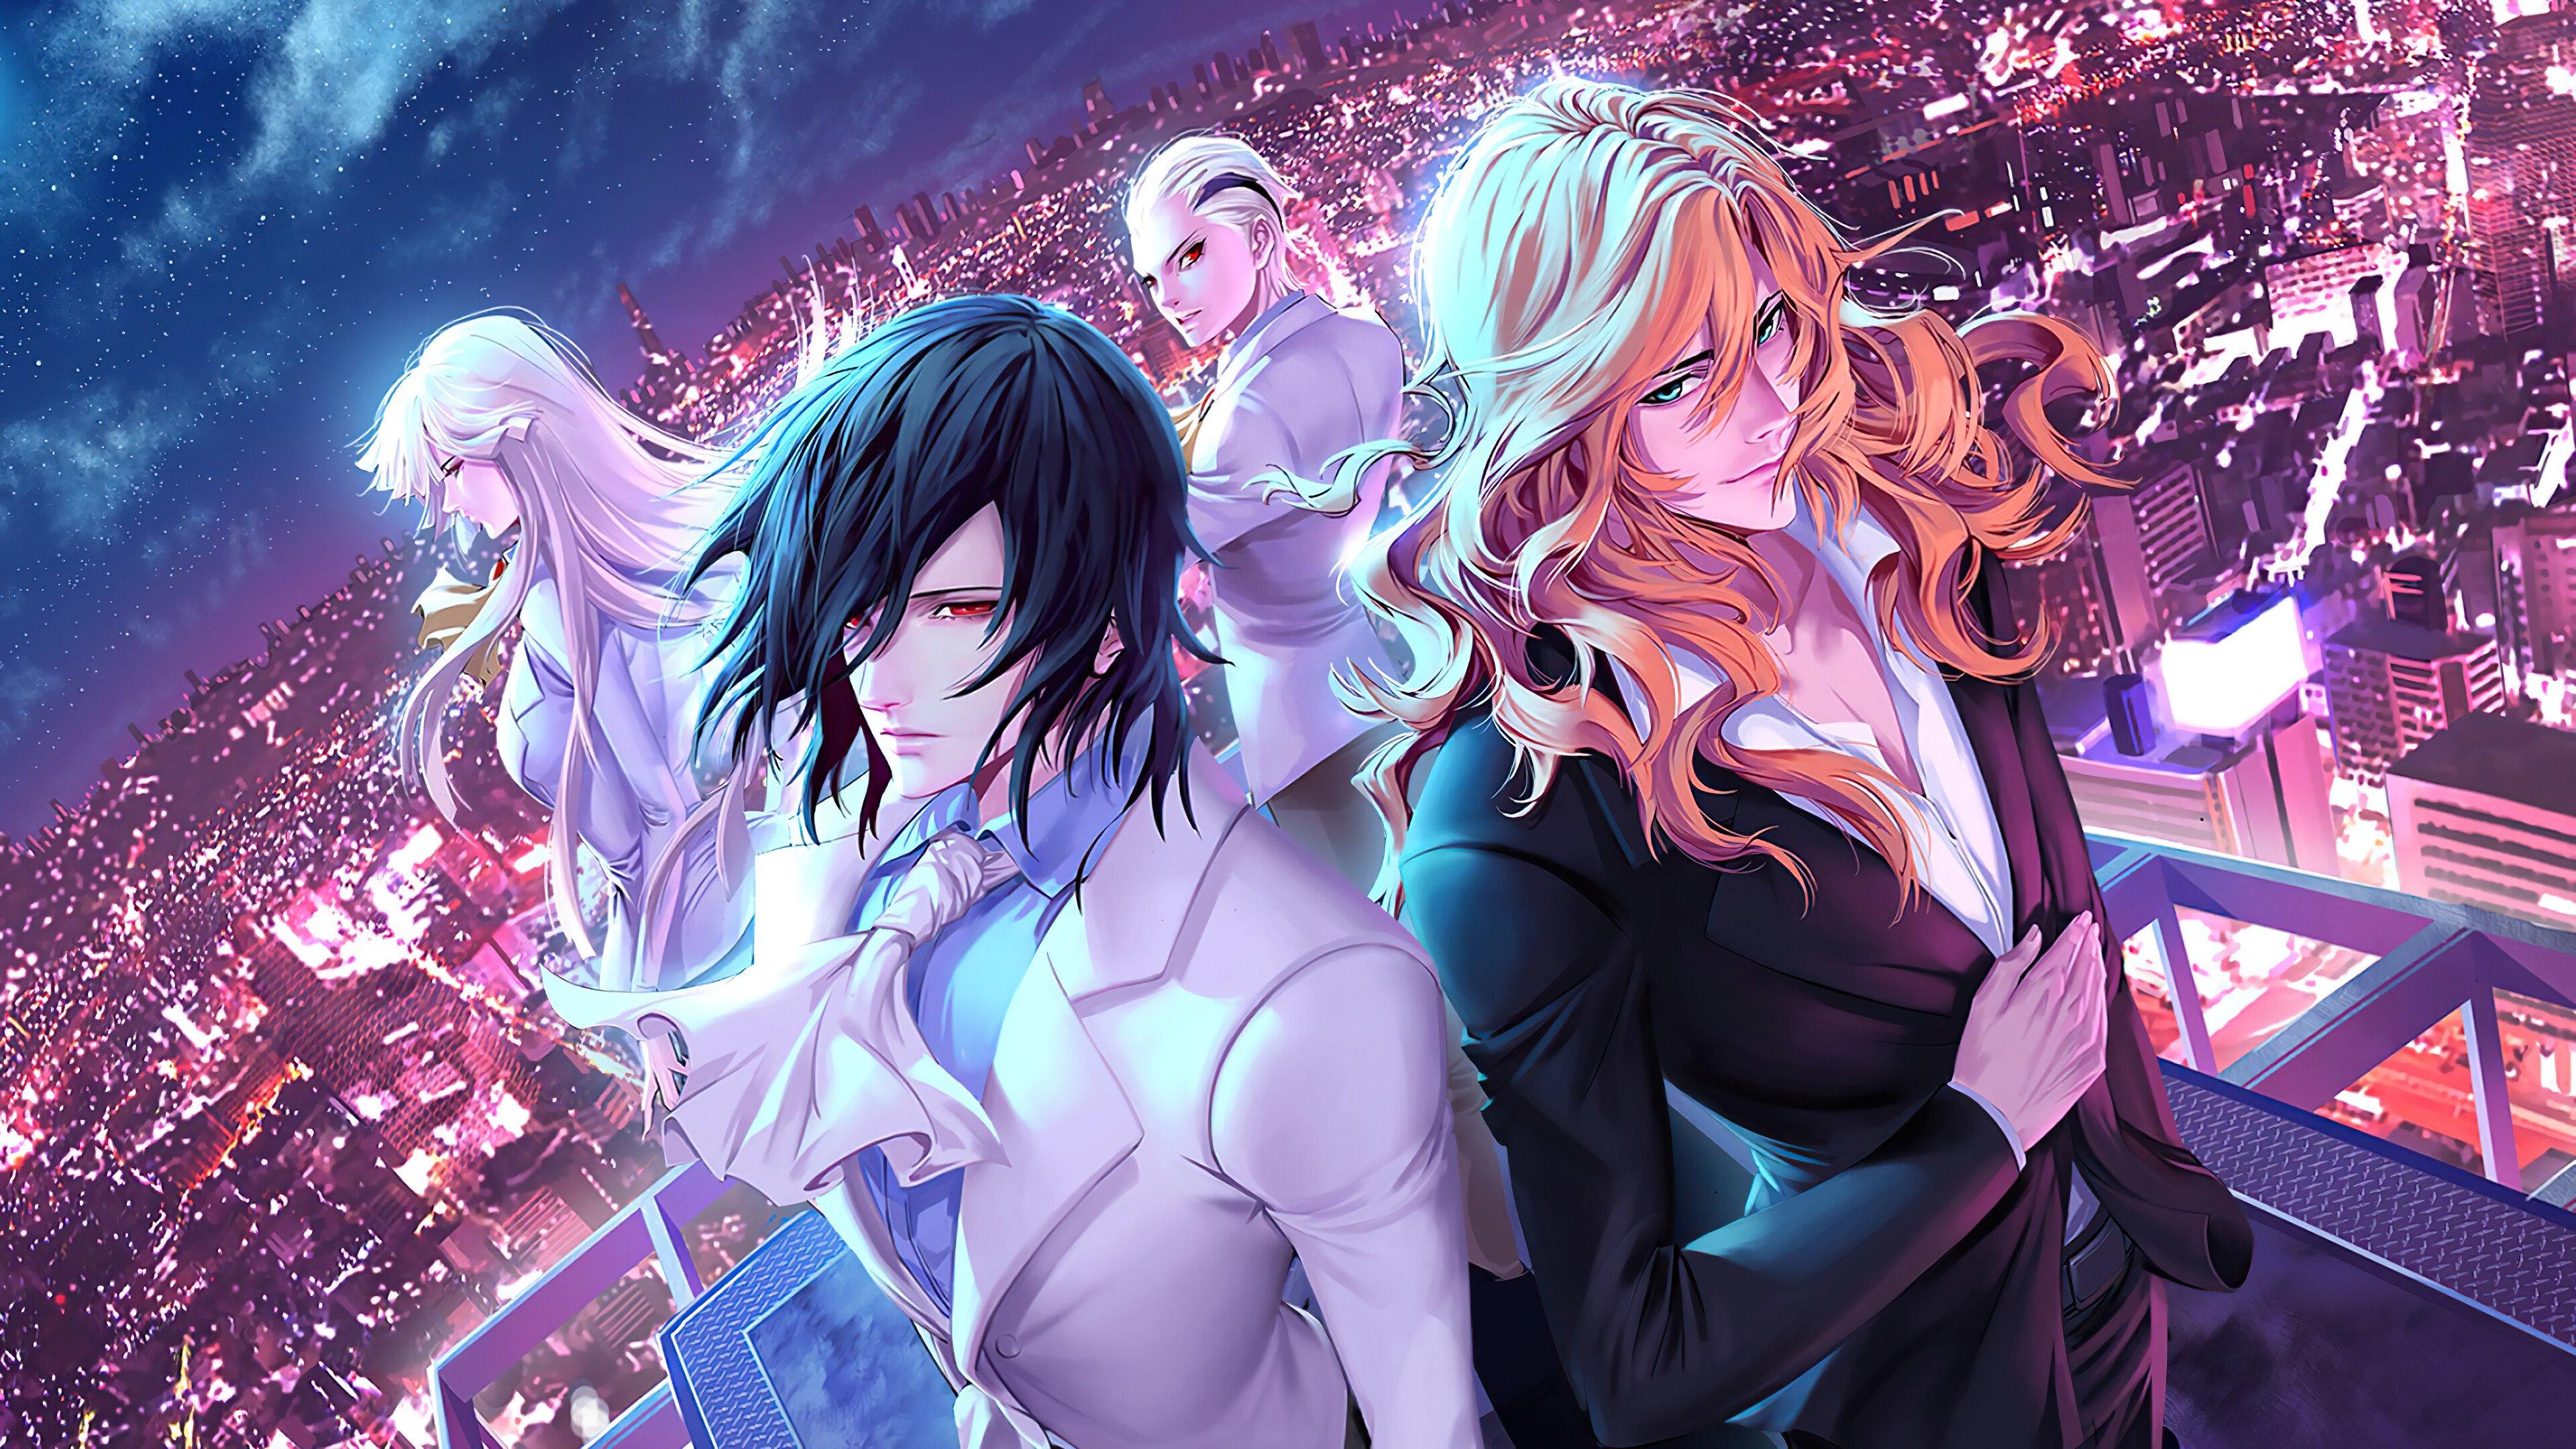 Fondos de pantalla Anime Personajes de Noblesse